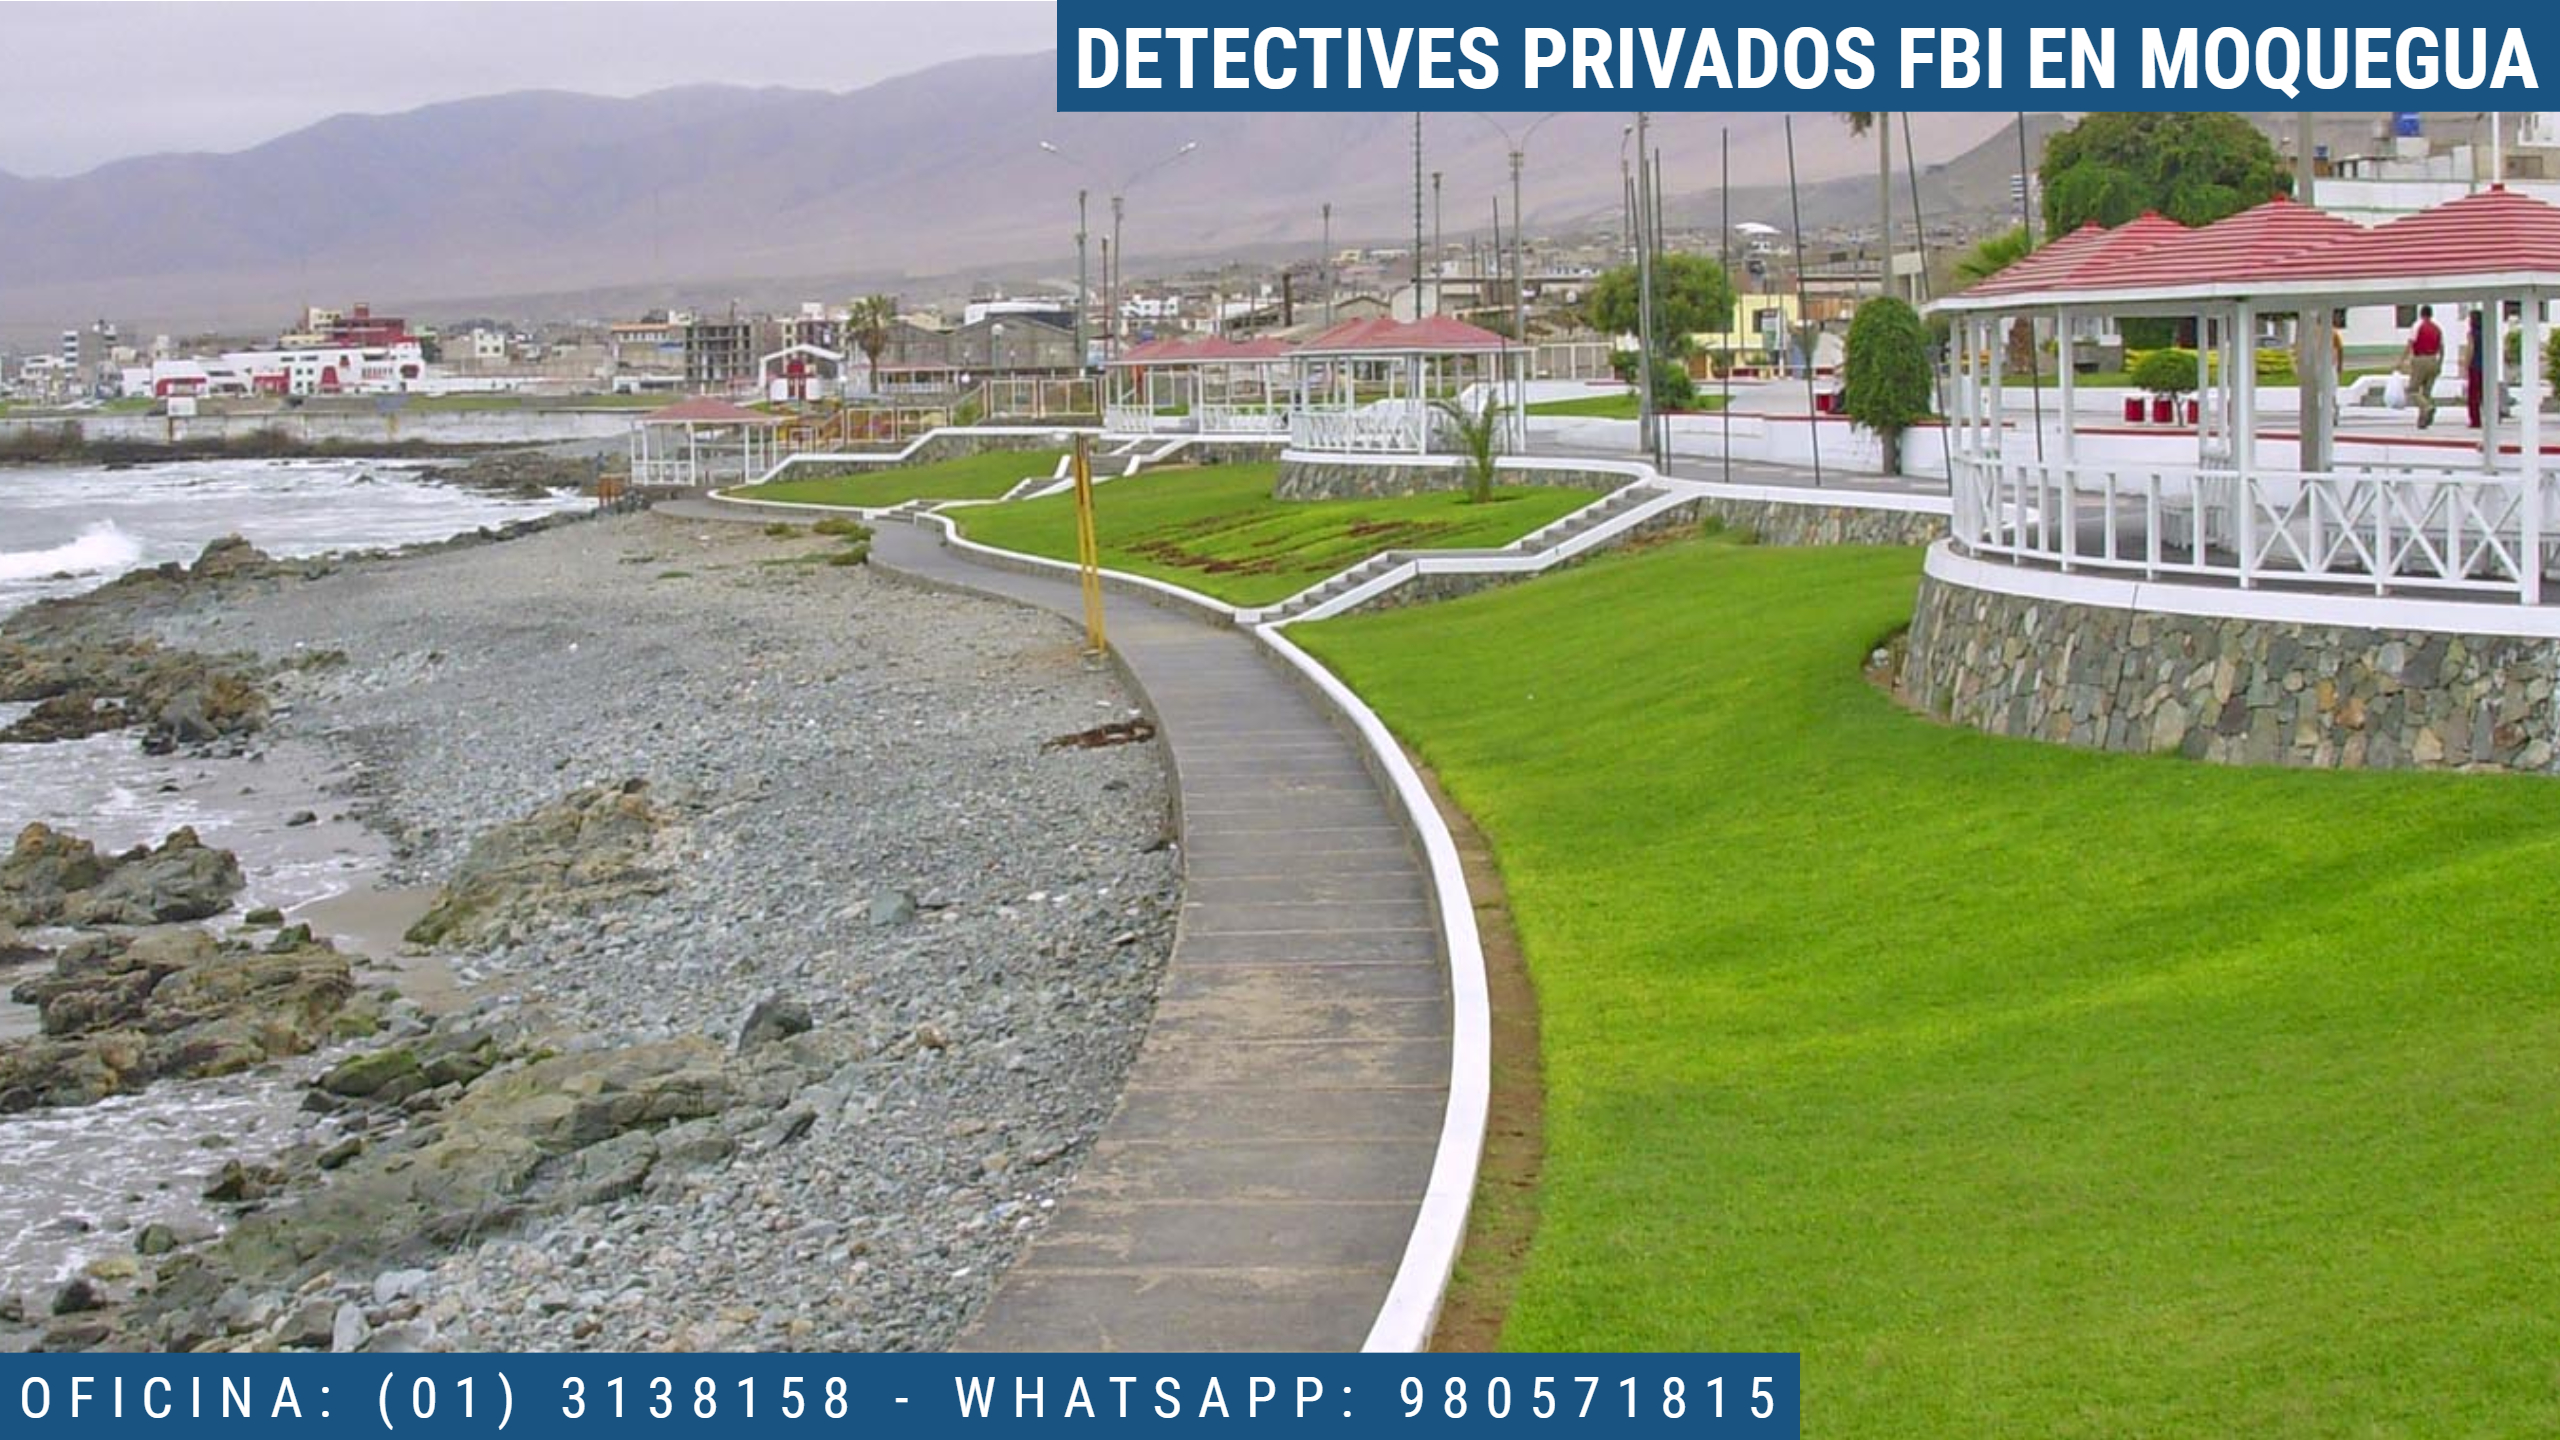 INVESTIGACIÓN PRIVADA FBI EN MOQUEGUA - PERU